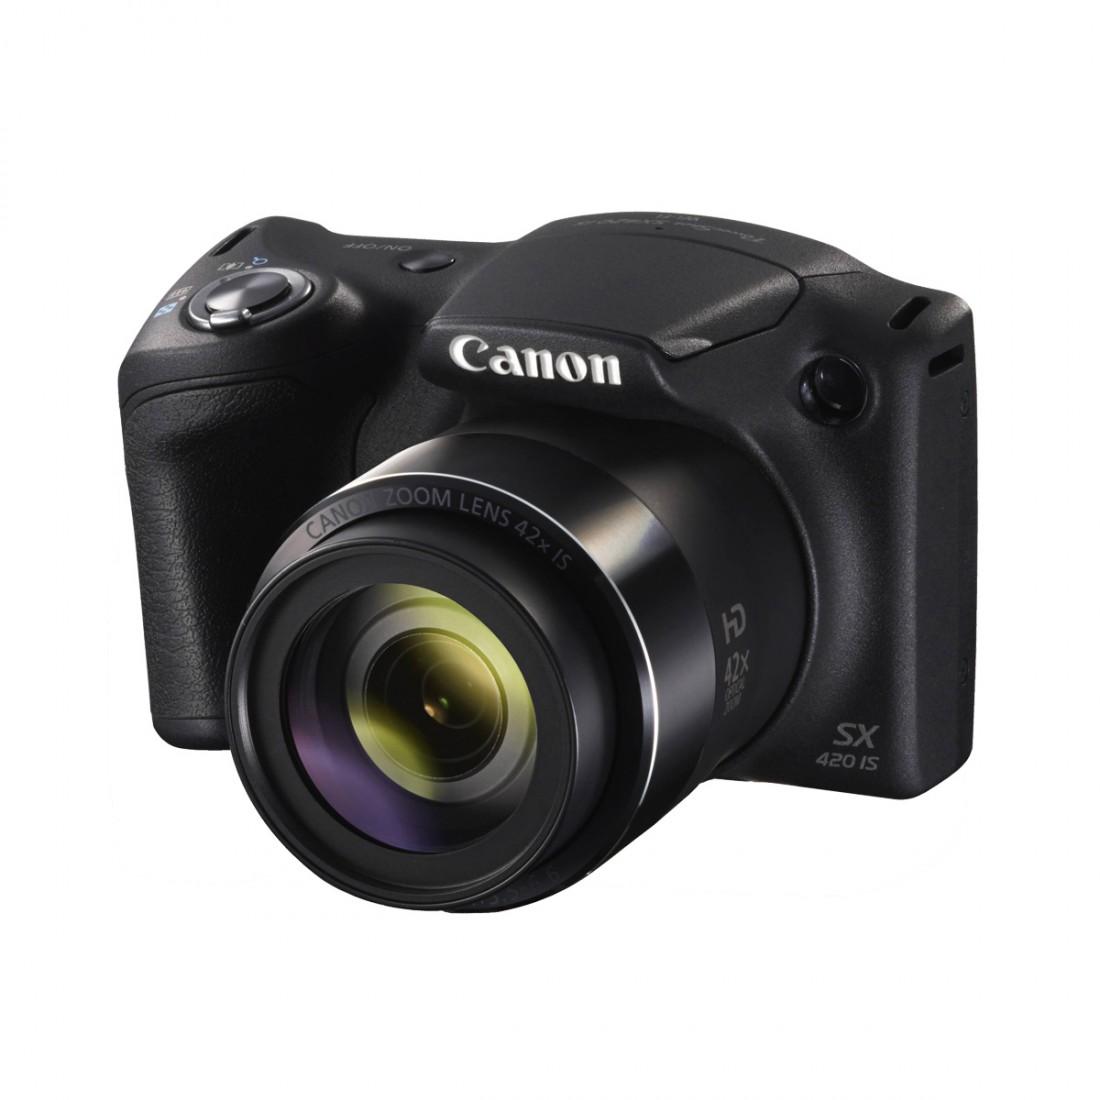 دوربين ديجيتال کانن مدل Canon PowerShot SX420 IS Digital Camera